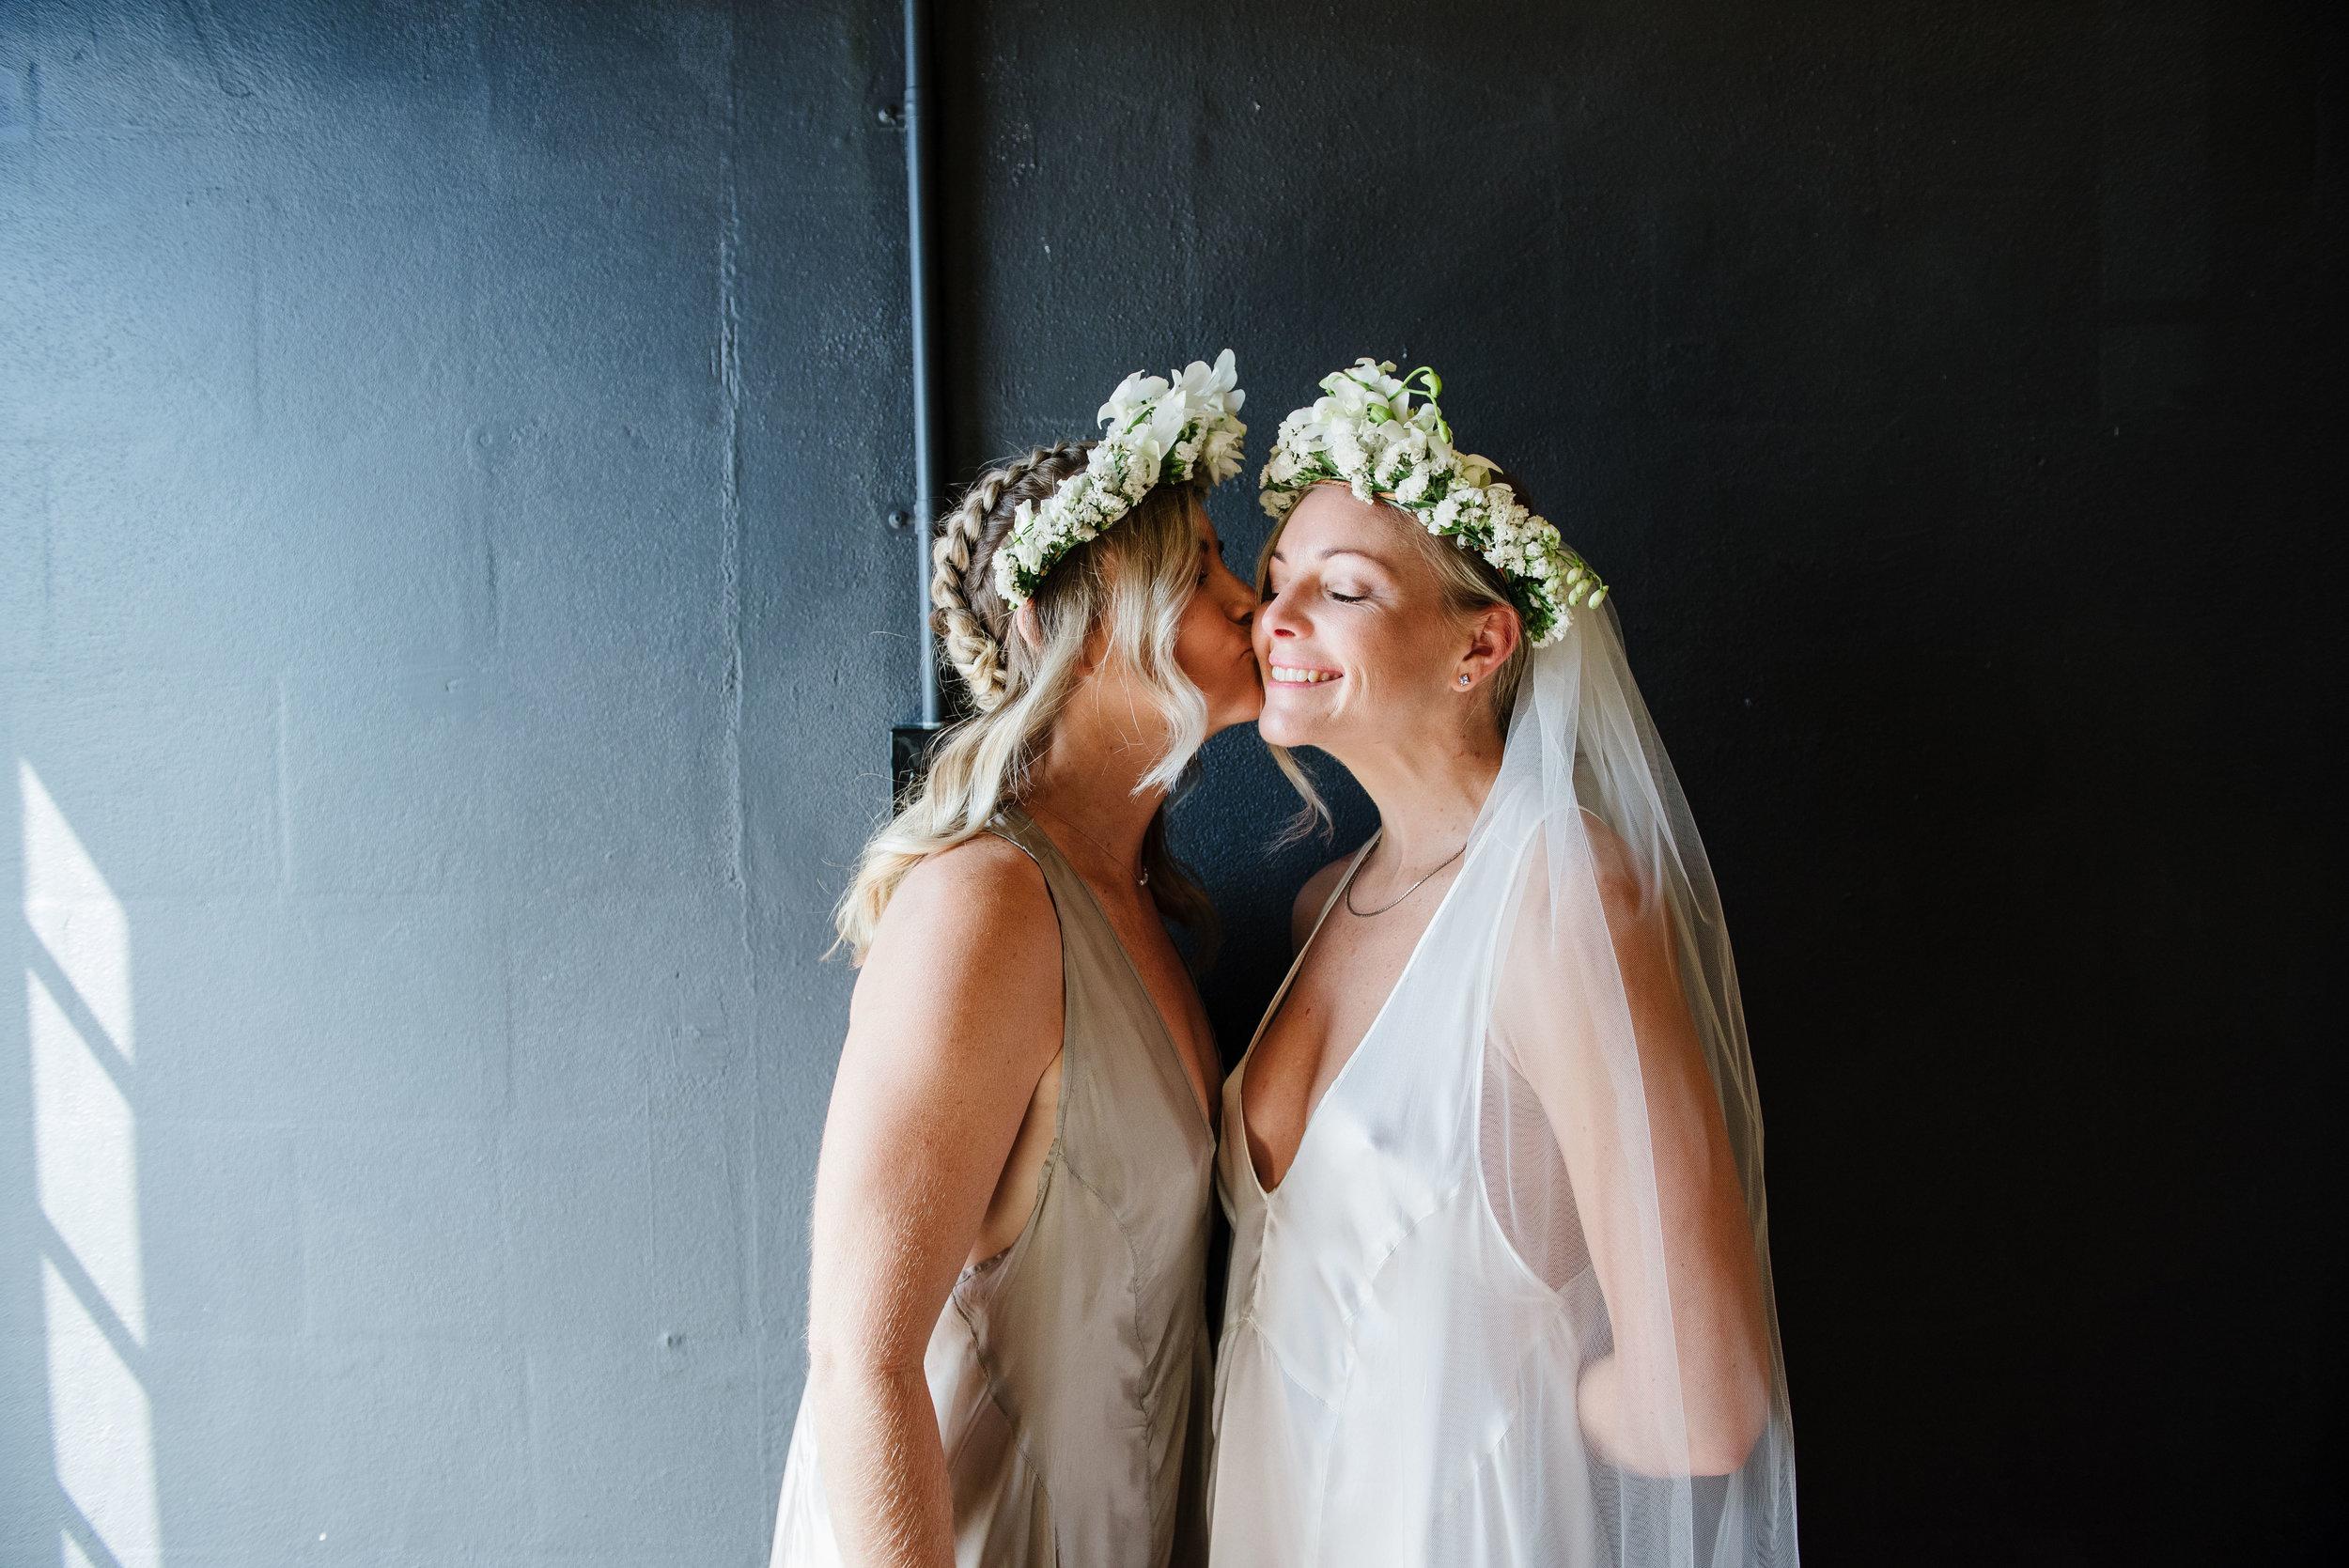 Carla and Luke- wedding photographer, byron bay wedding and family photographer, tweed heads wedding and family photography-98.jpg